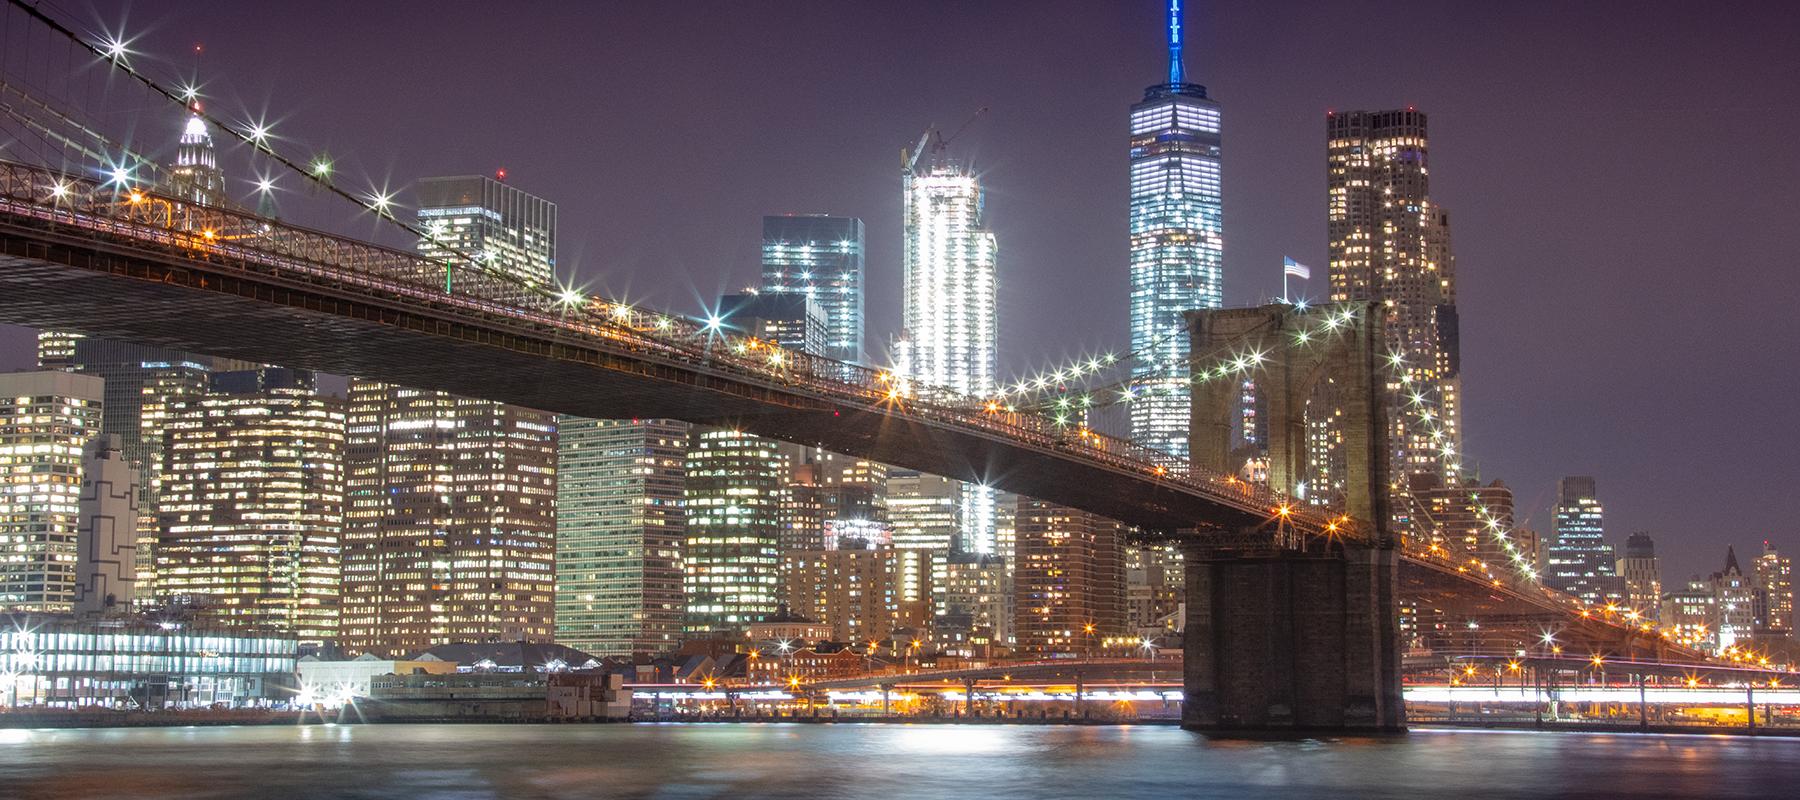 Brooklyn Bridge, New York - Russ Gostelow Photography